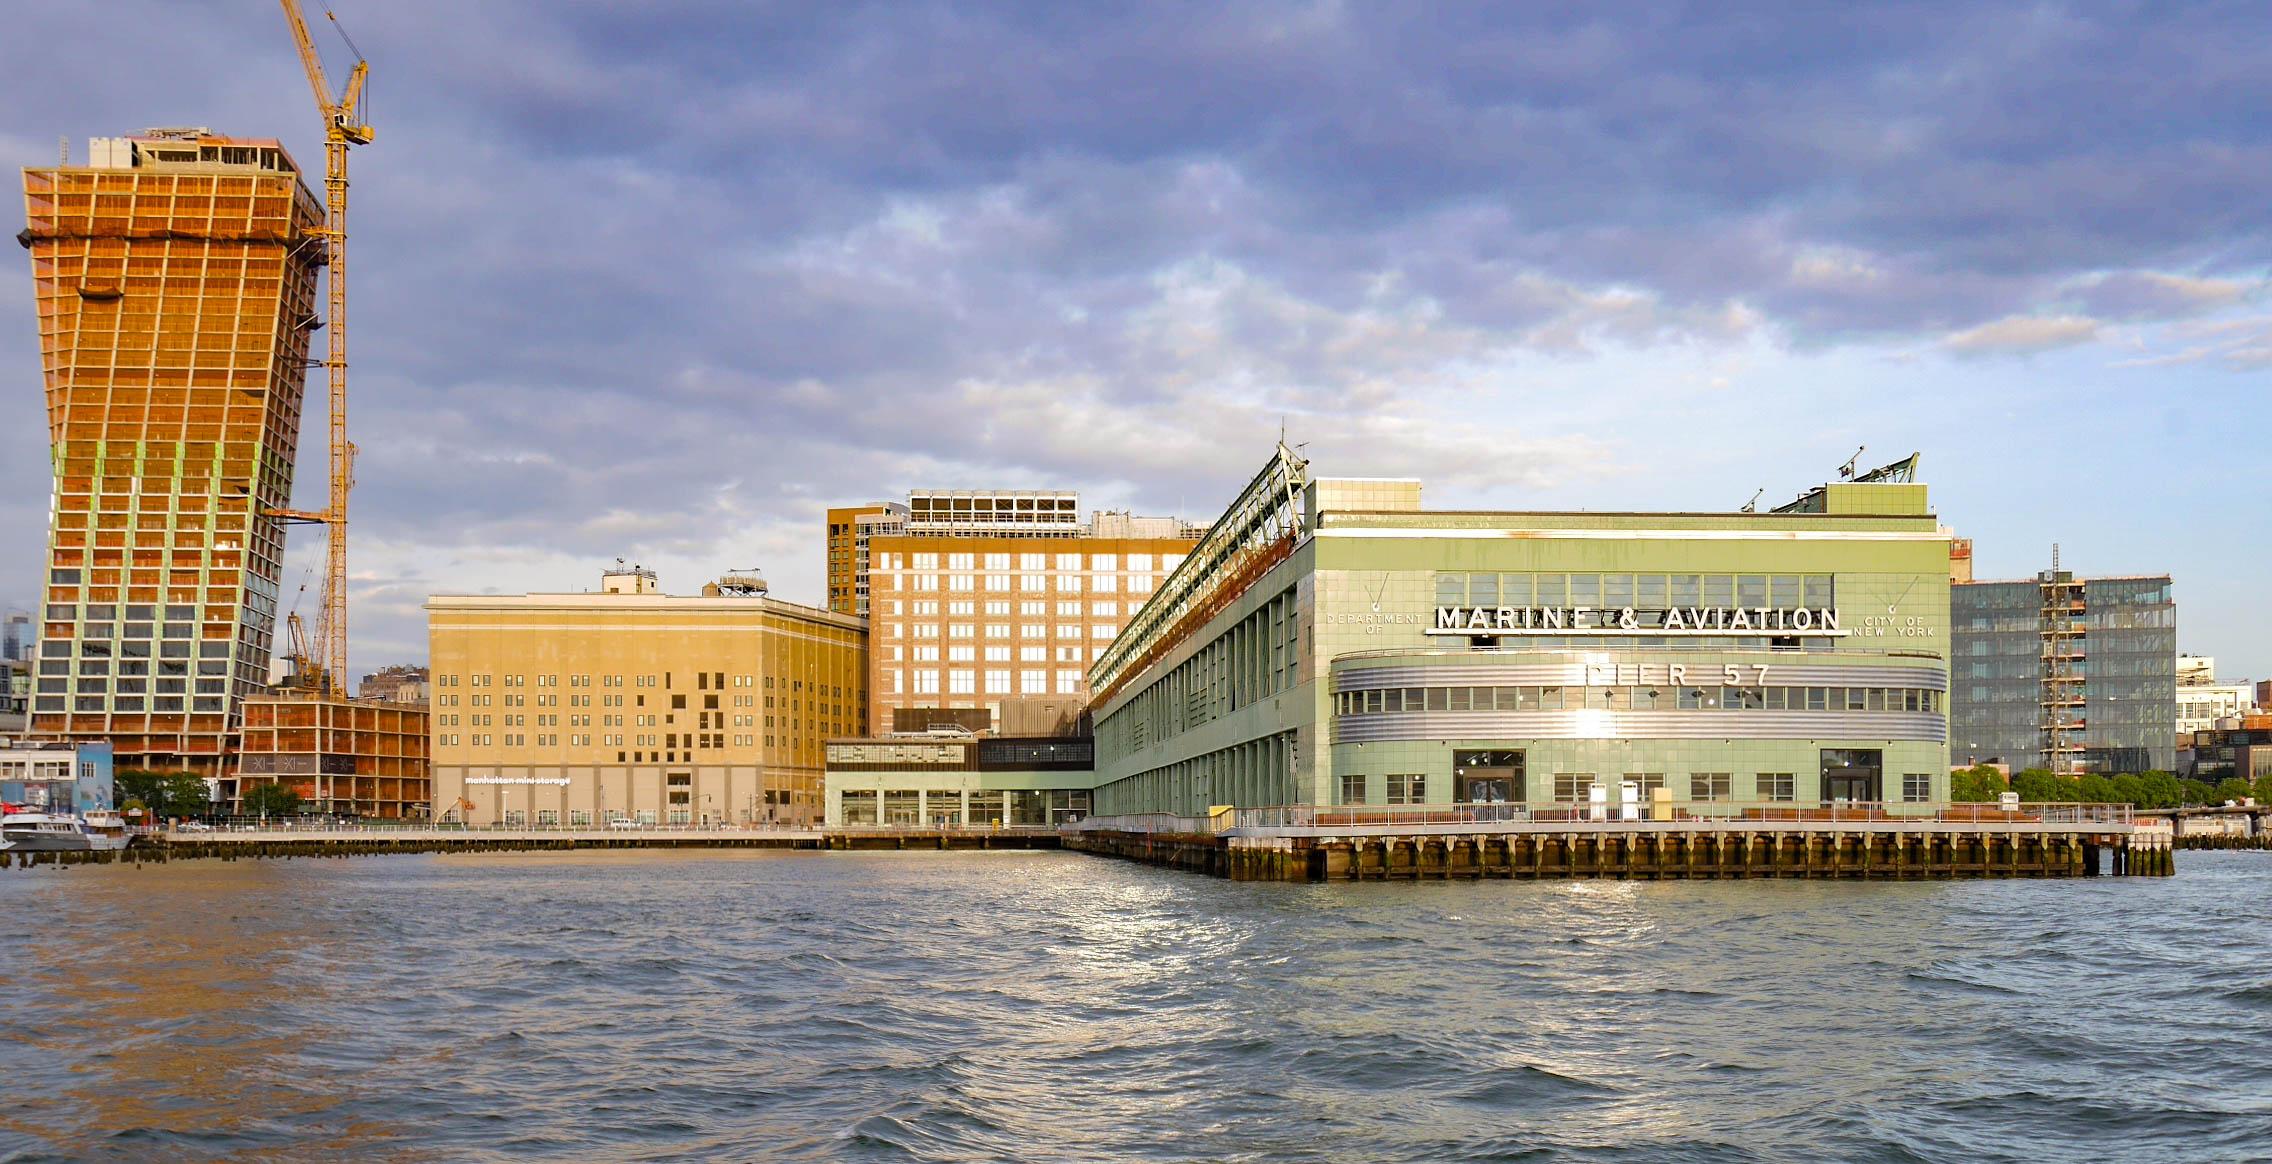 Marine & Aviation - Pier 57 - NYC